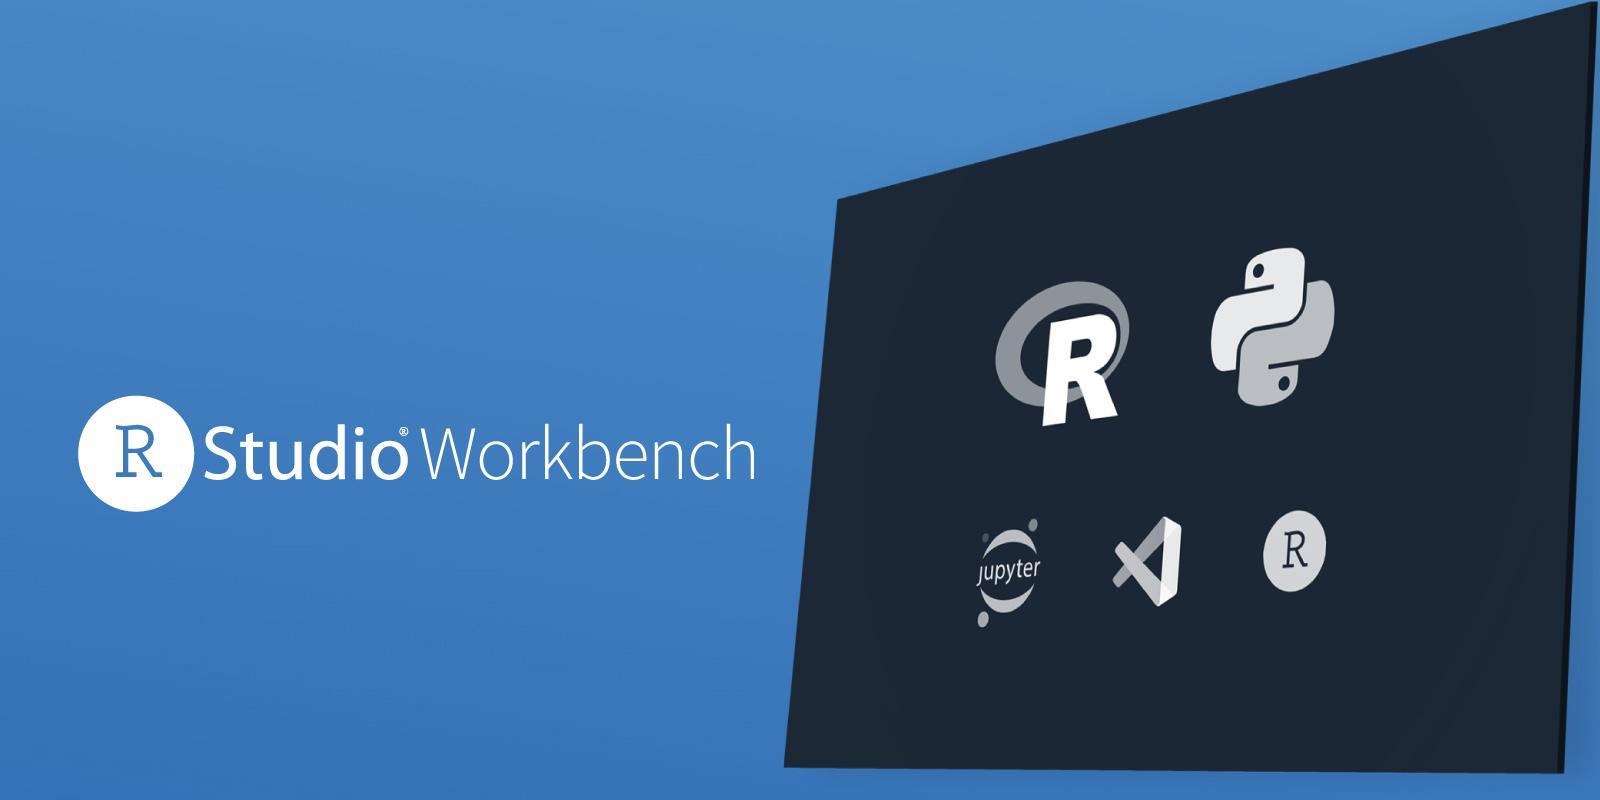 RStudio Workbench